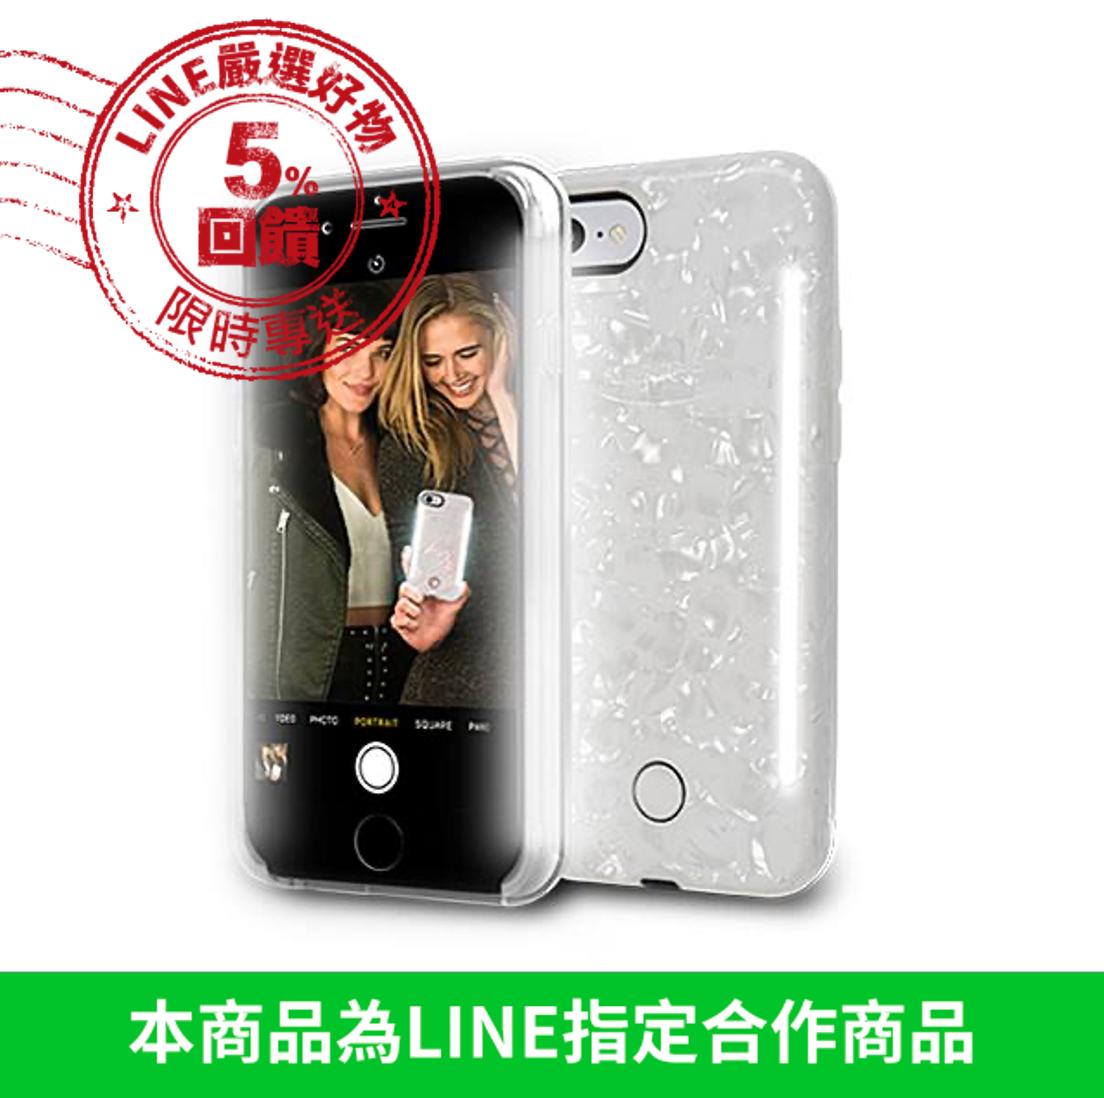 【 LUMEE 】 雙面 LED 補光手機殼 (iphone 6 / 6s / 7 / 8 / 6+ / 7+ / 8+ /  X / XS / XS Max)